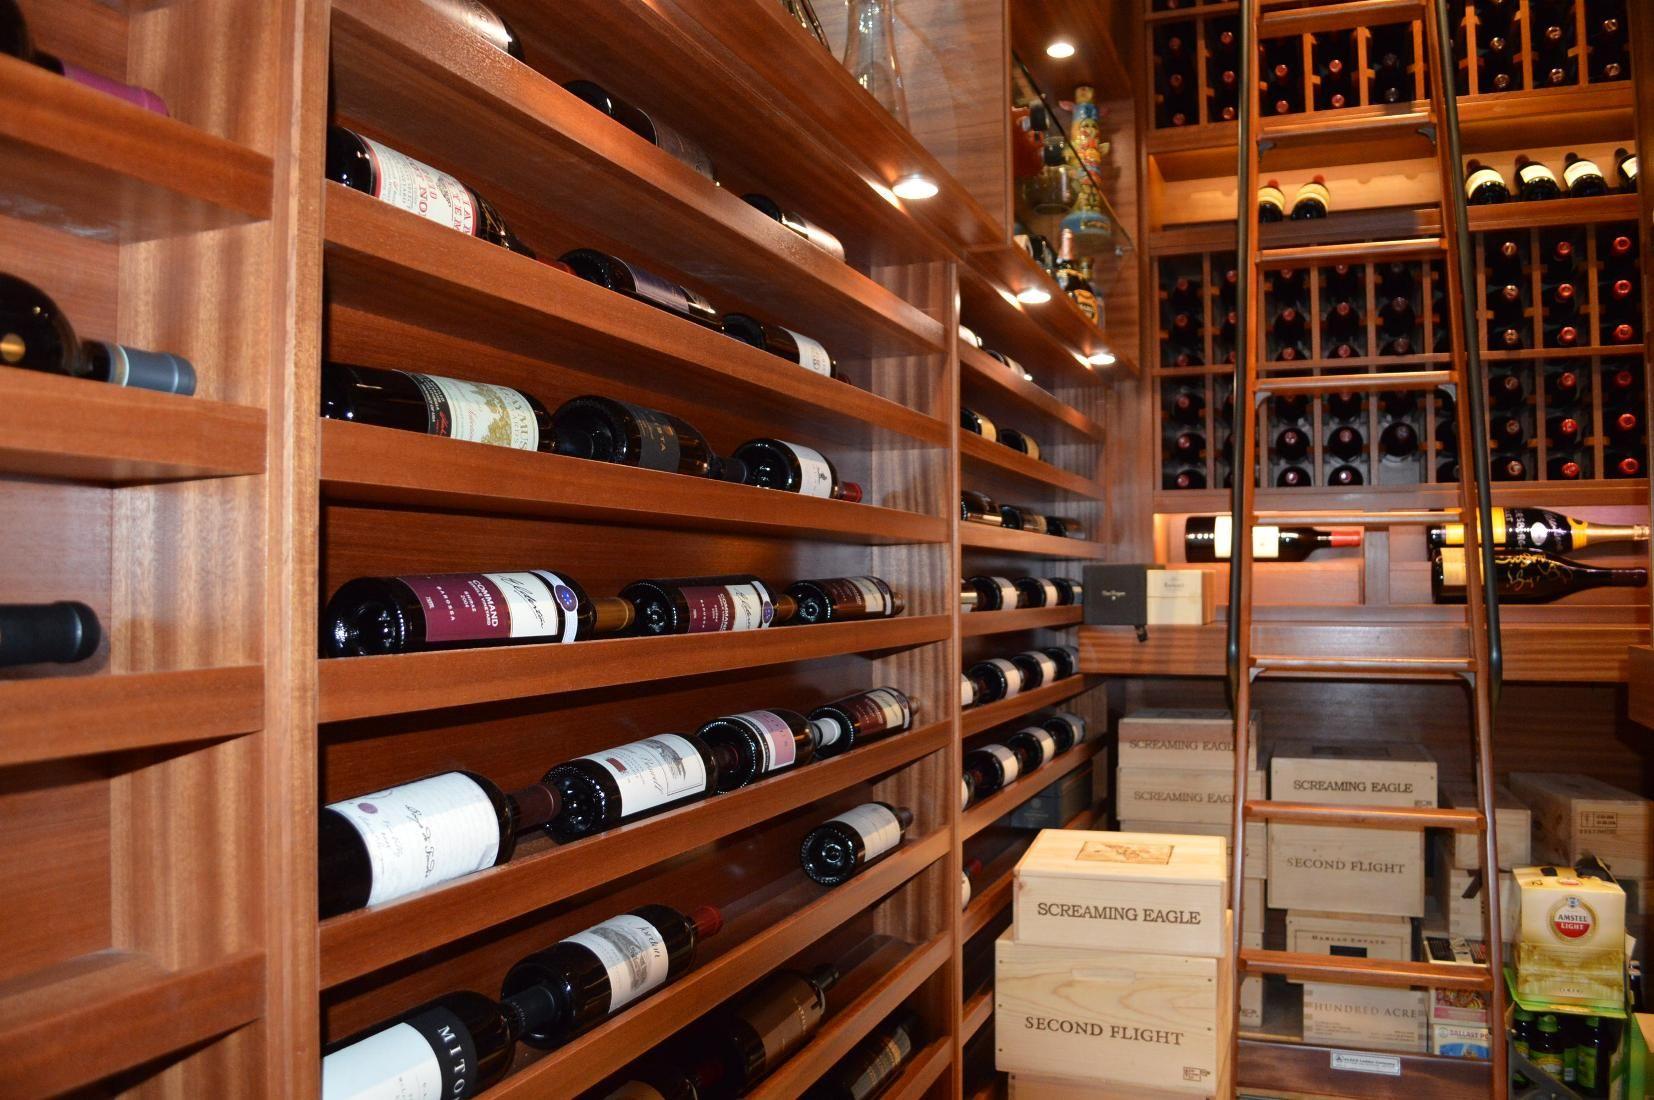 Horizontal Display and Case Storage Racks Miami Custom Wine Cellar & 6. Horizontal Display and Case Storage Racks Miami Custom Wine ...